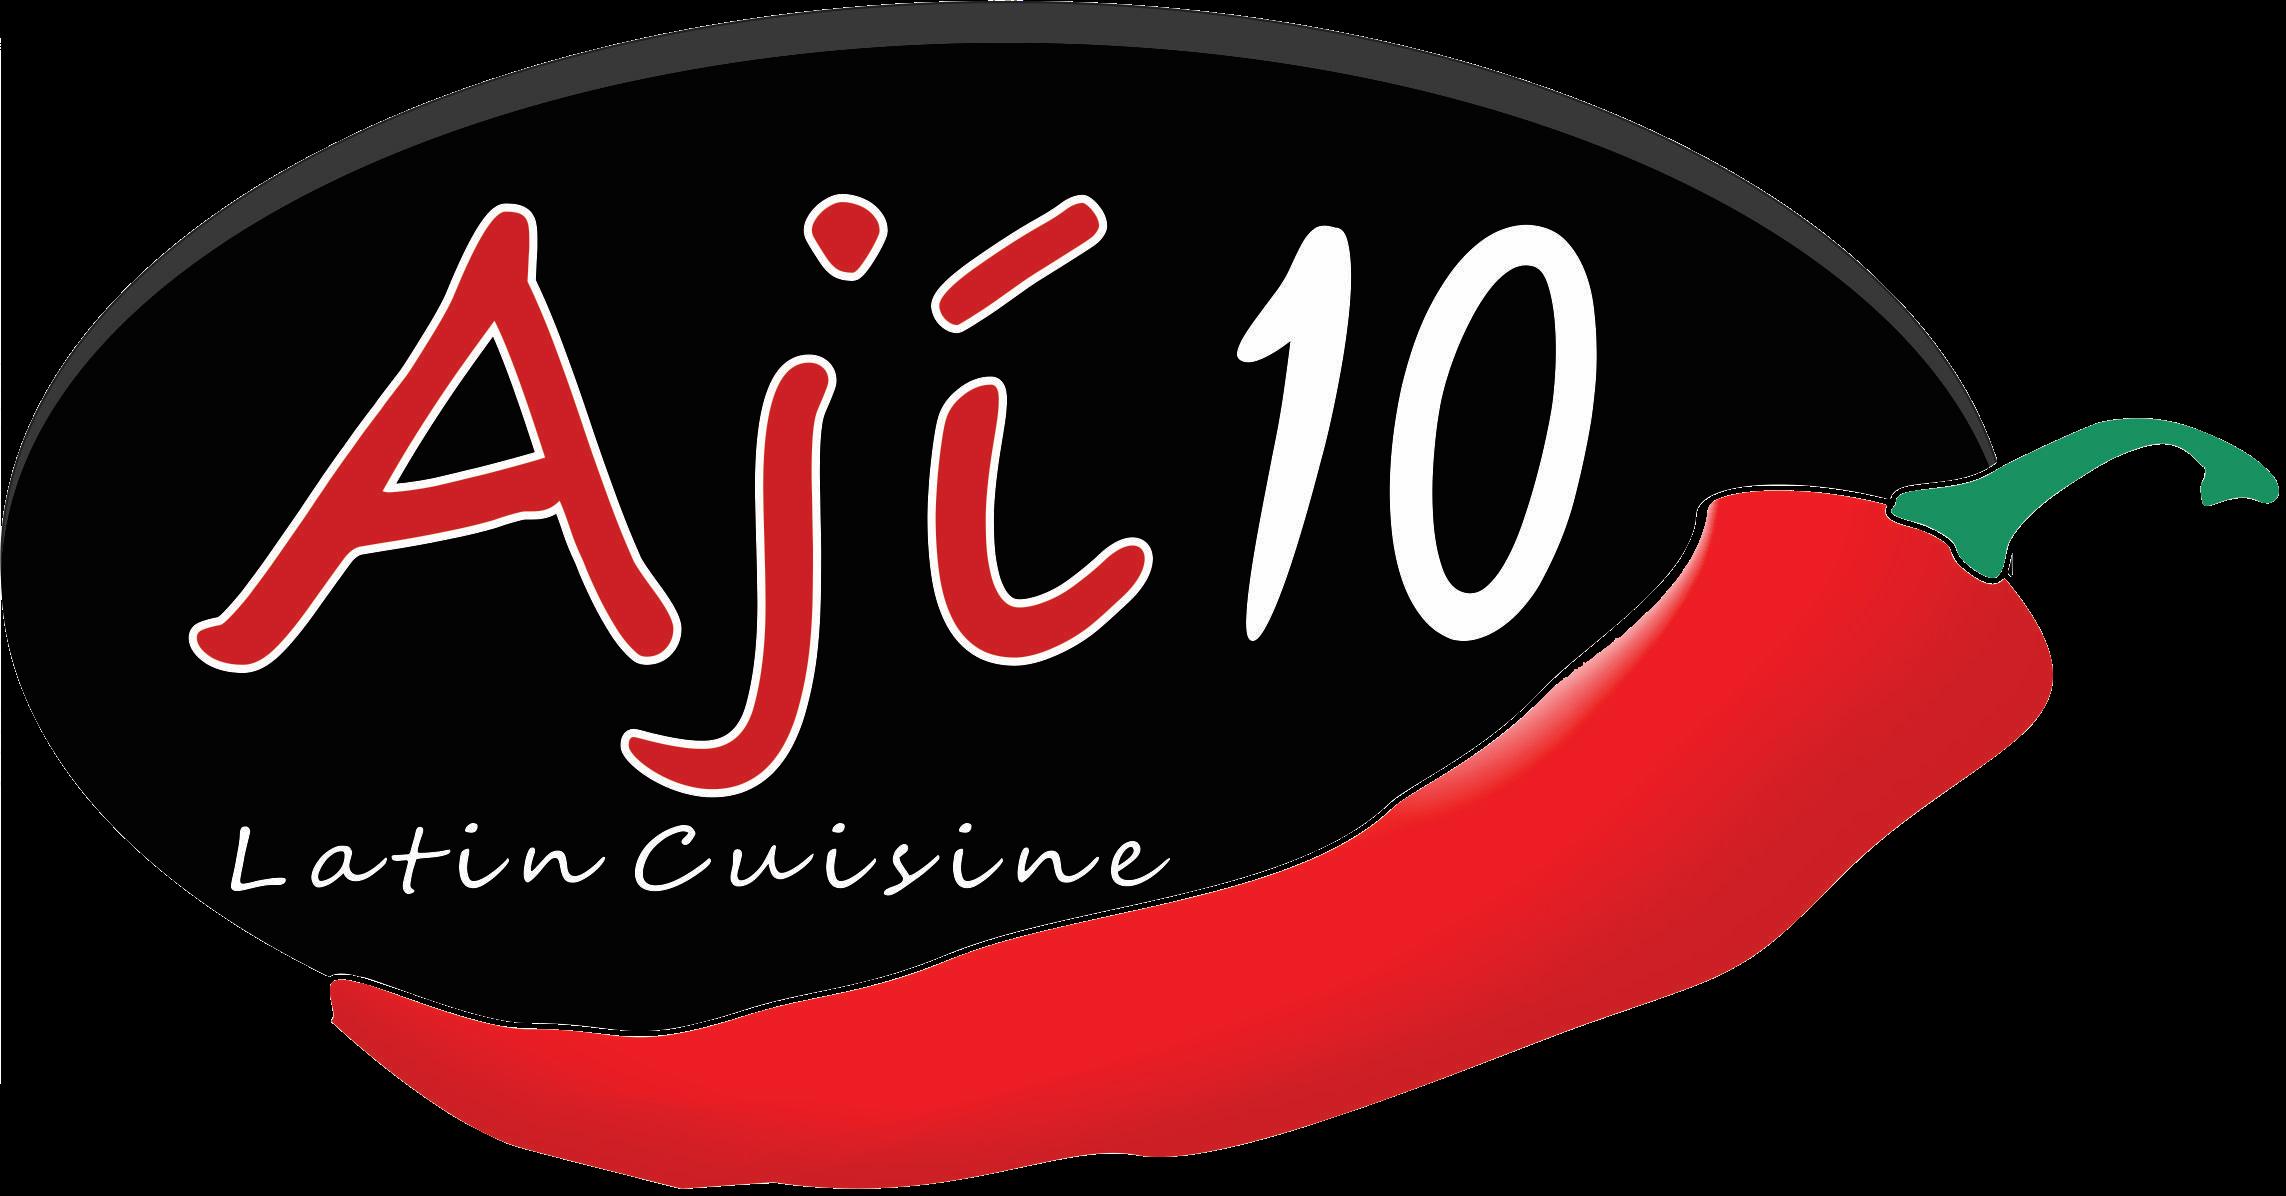 aji10